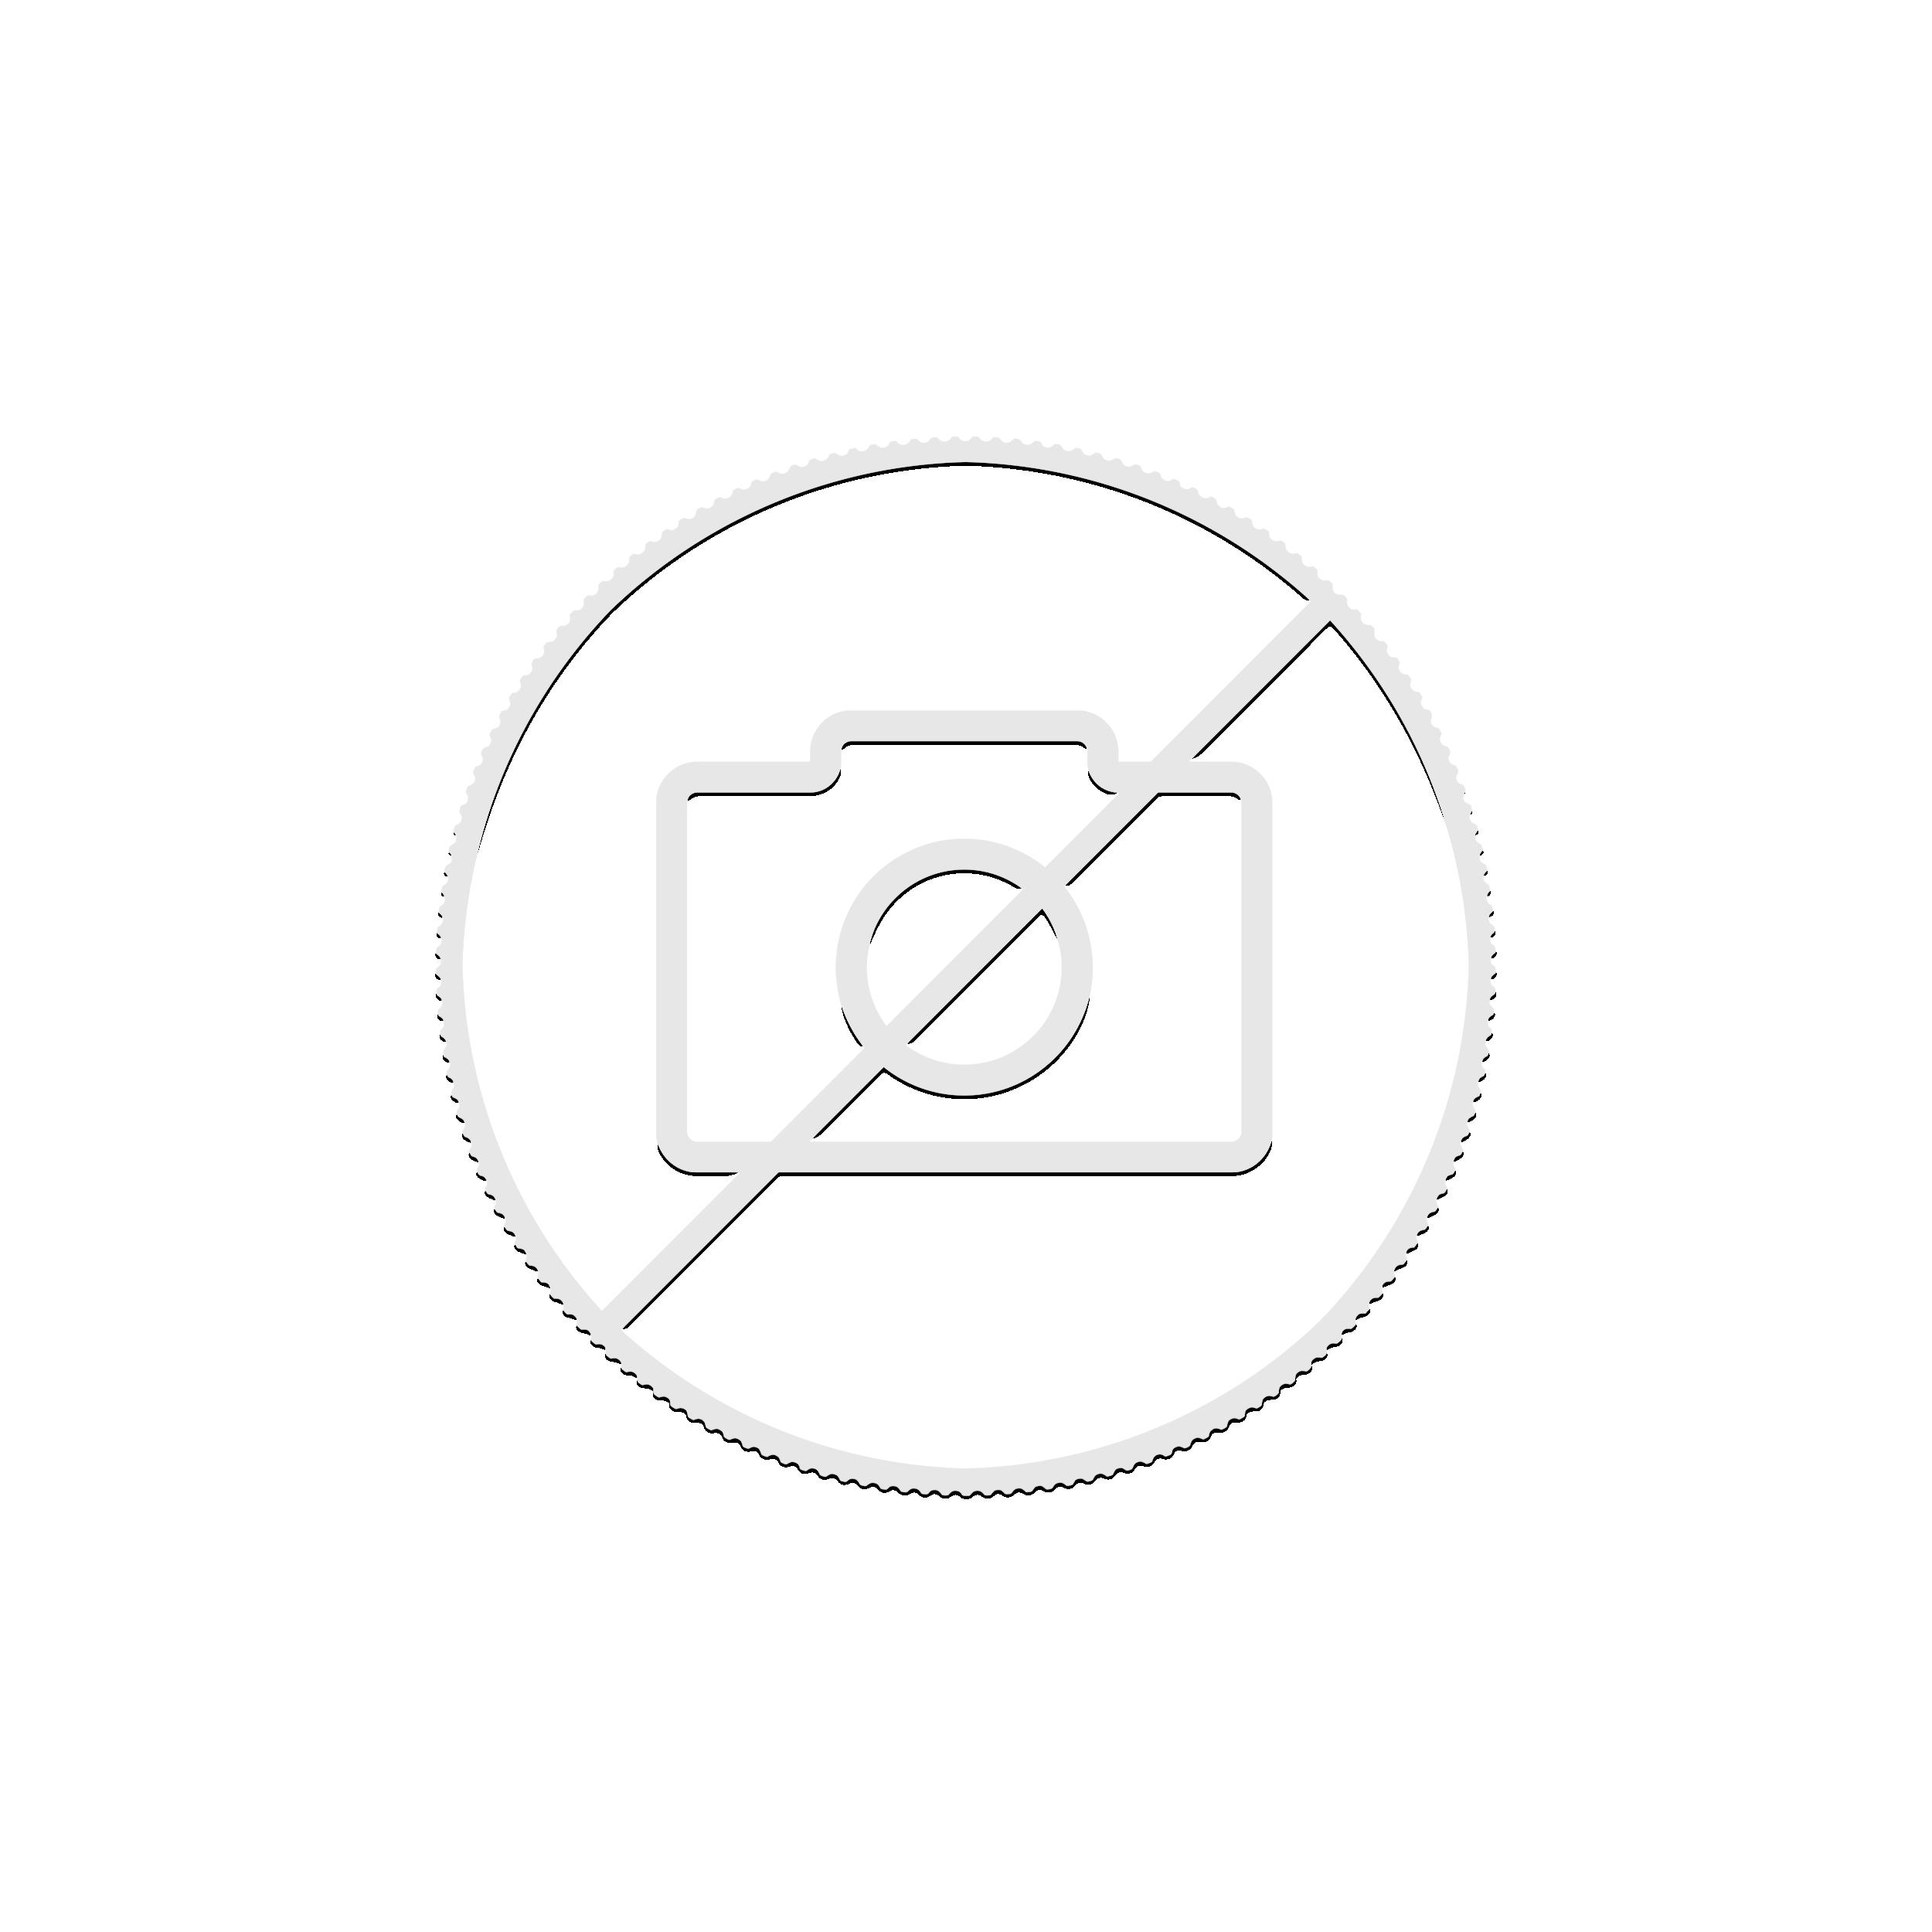 The Silver Mountain Box voor 100 zilveren Maple Leaf munten